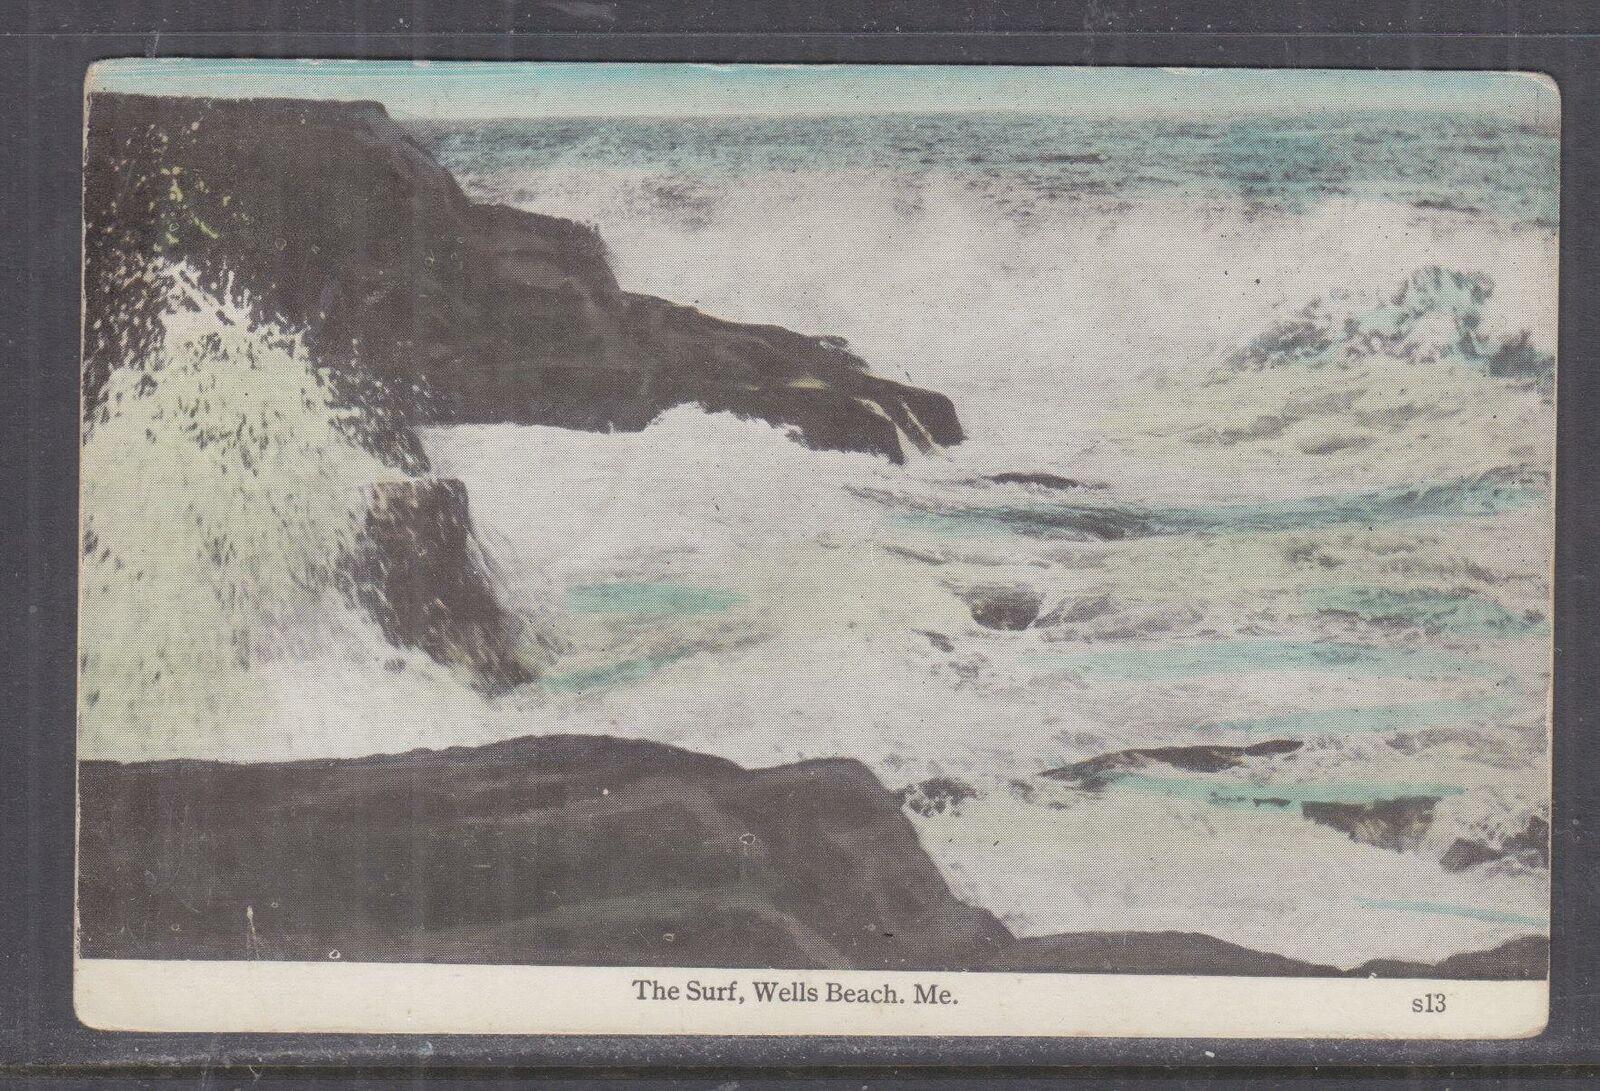 UNITED STATES, 1934 ppc. Wells Beach, Maine, 1c Wells, Maine to Worcestor, Mass